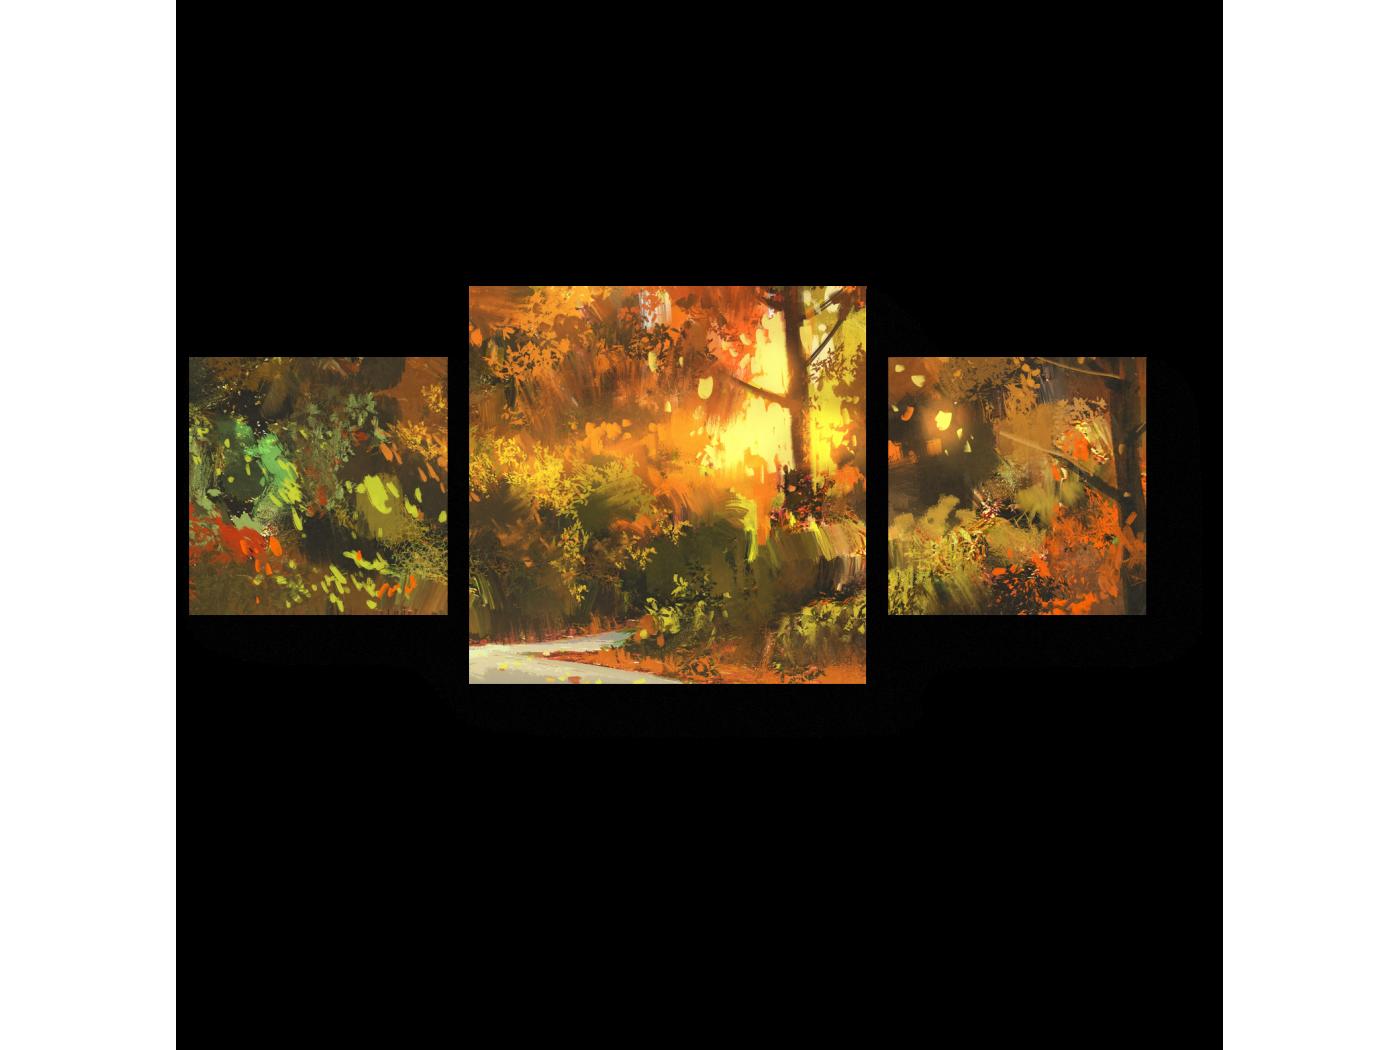 Модульная картина Прогулка по осеннему лесу (70x30) фото